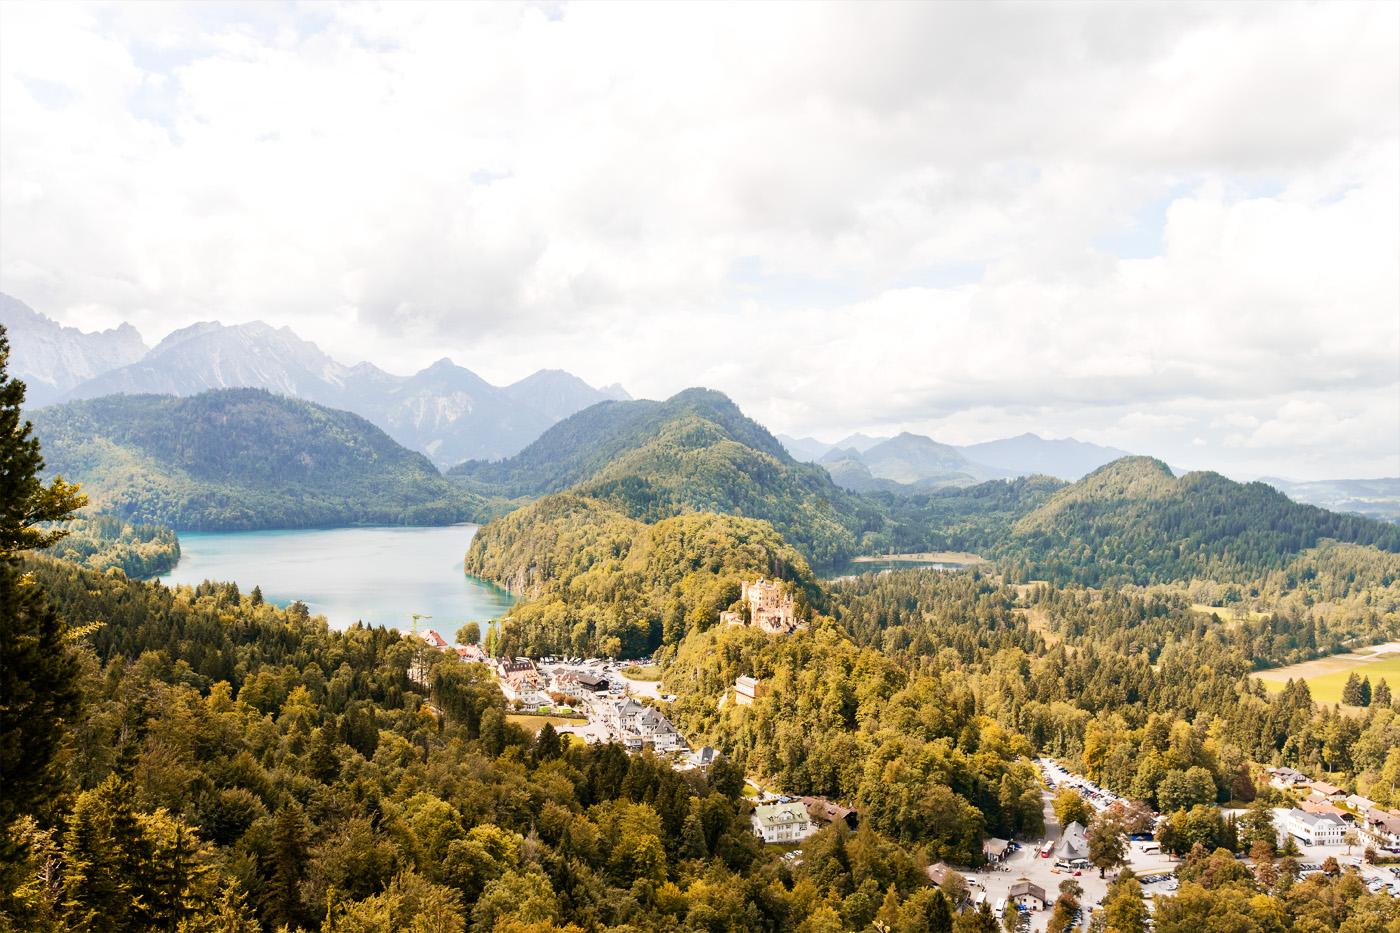 schloss-hohenschwangau-allgaeu-royal-castle-hohenschwangau-alpsee-travelbericht